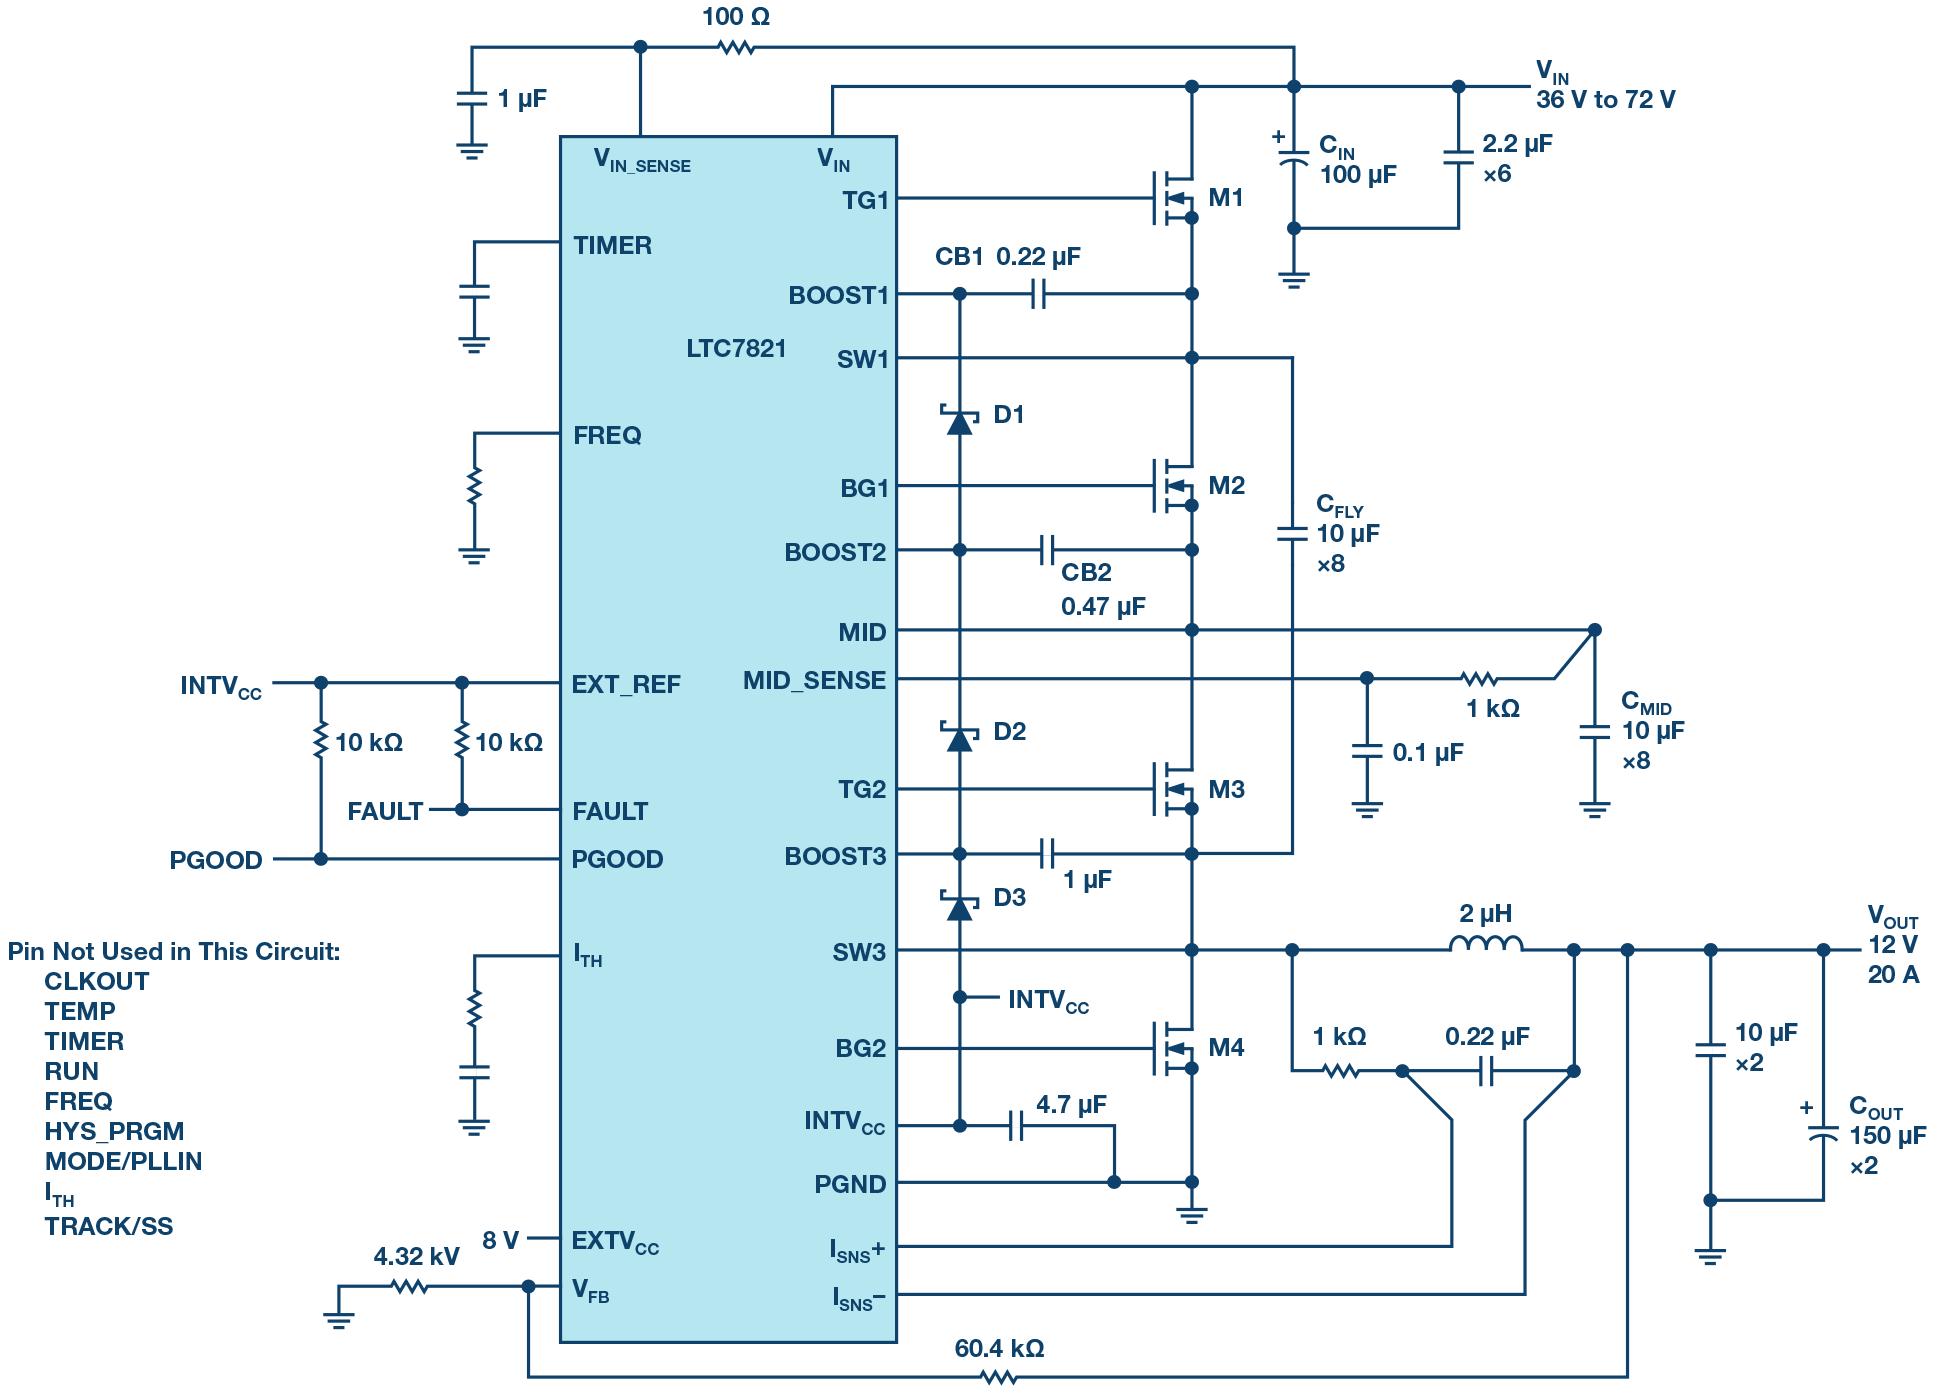 medium resolution of 72 v hybrid dc to dc converter reduces intermediate bus converter 36 volt to 12 converter wiring diagram